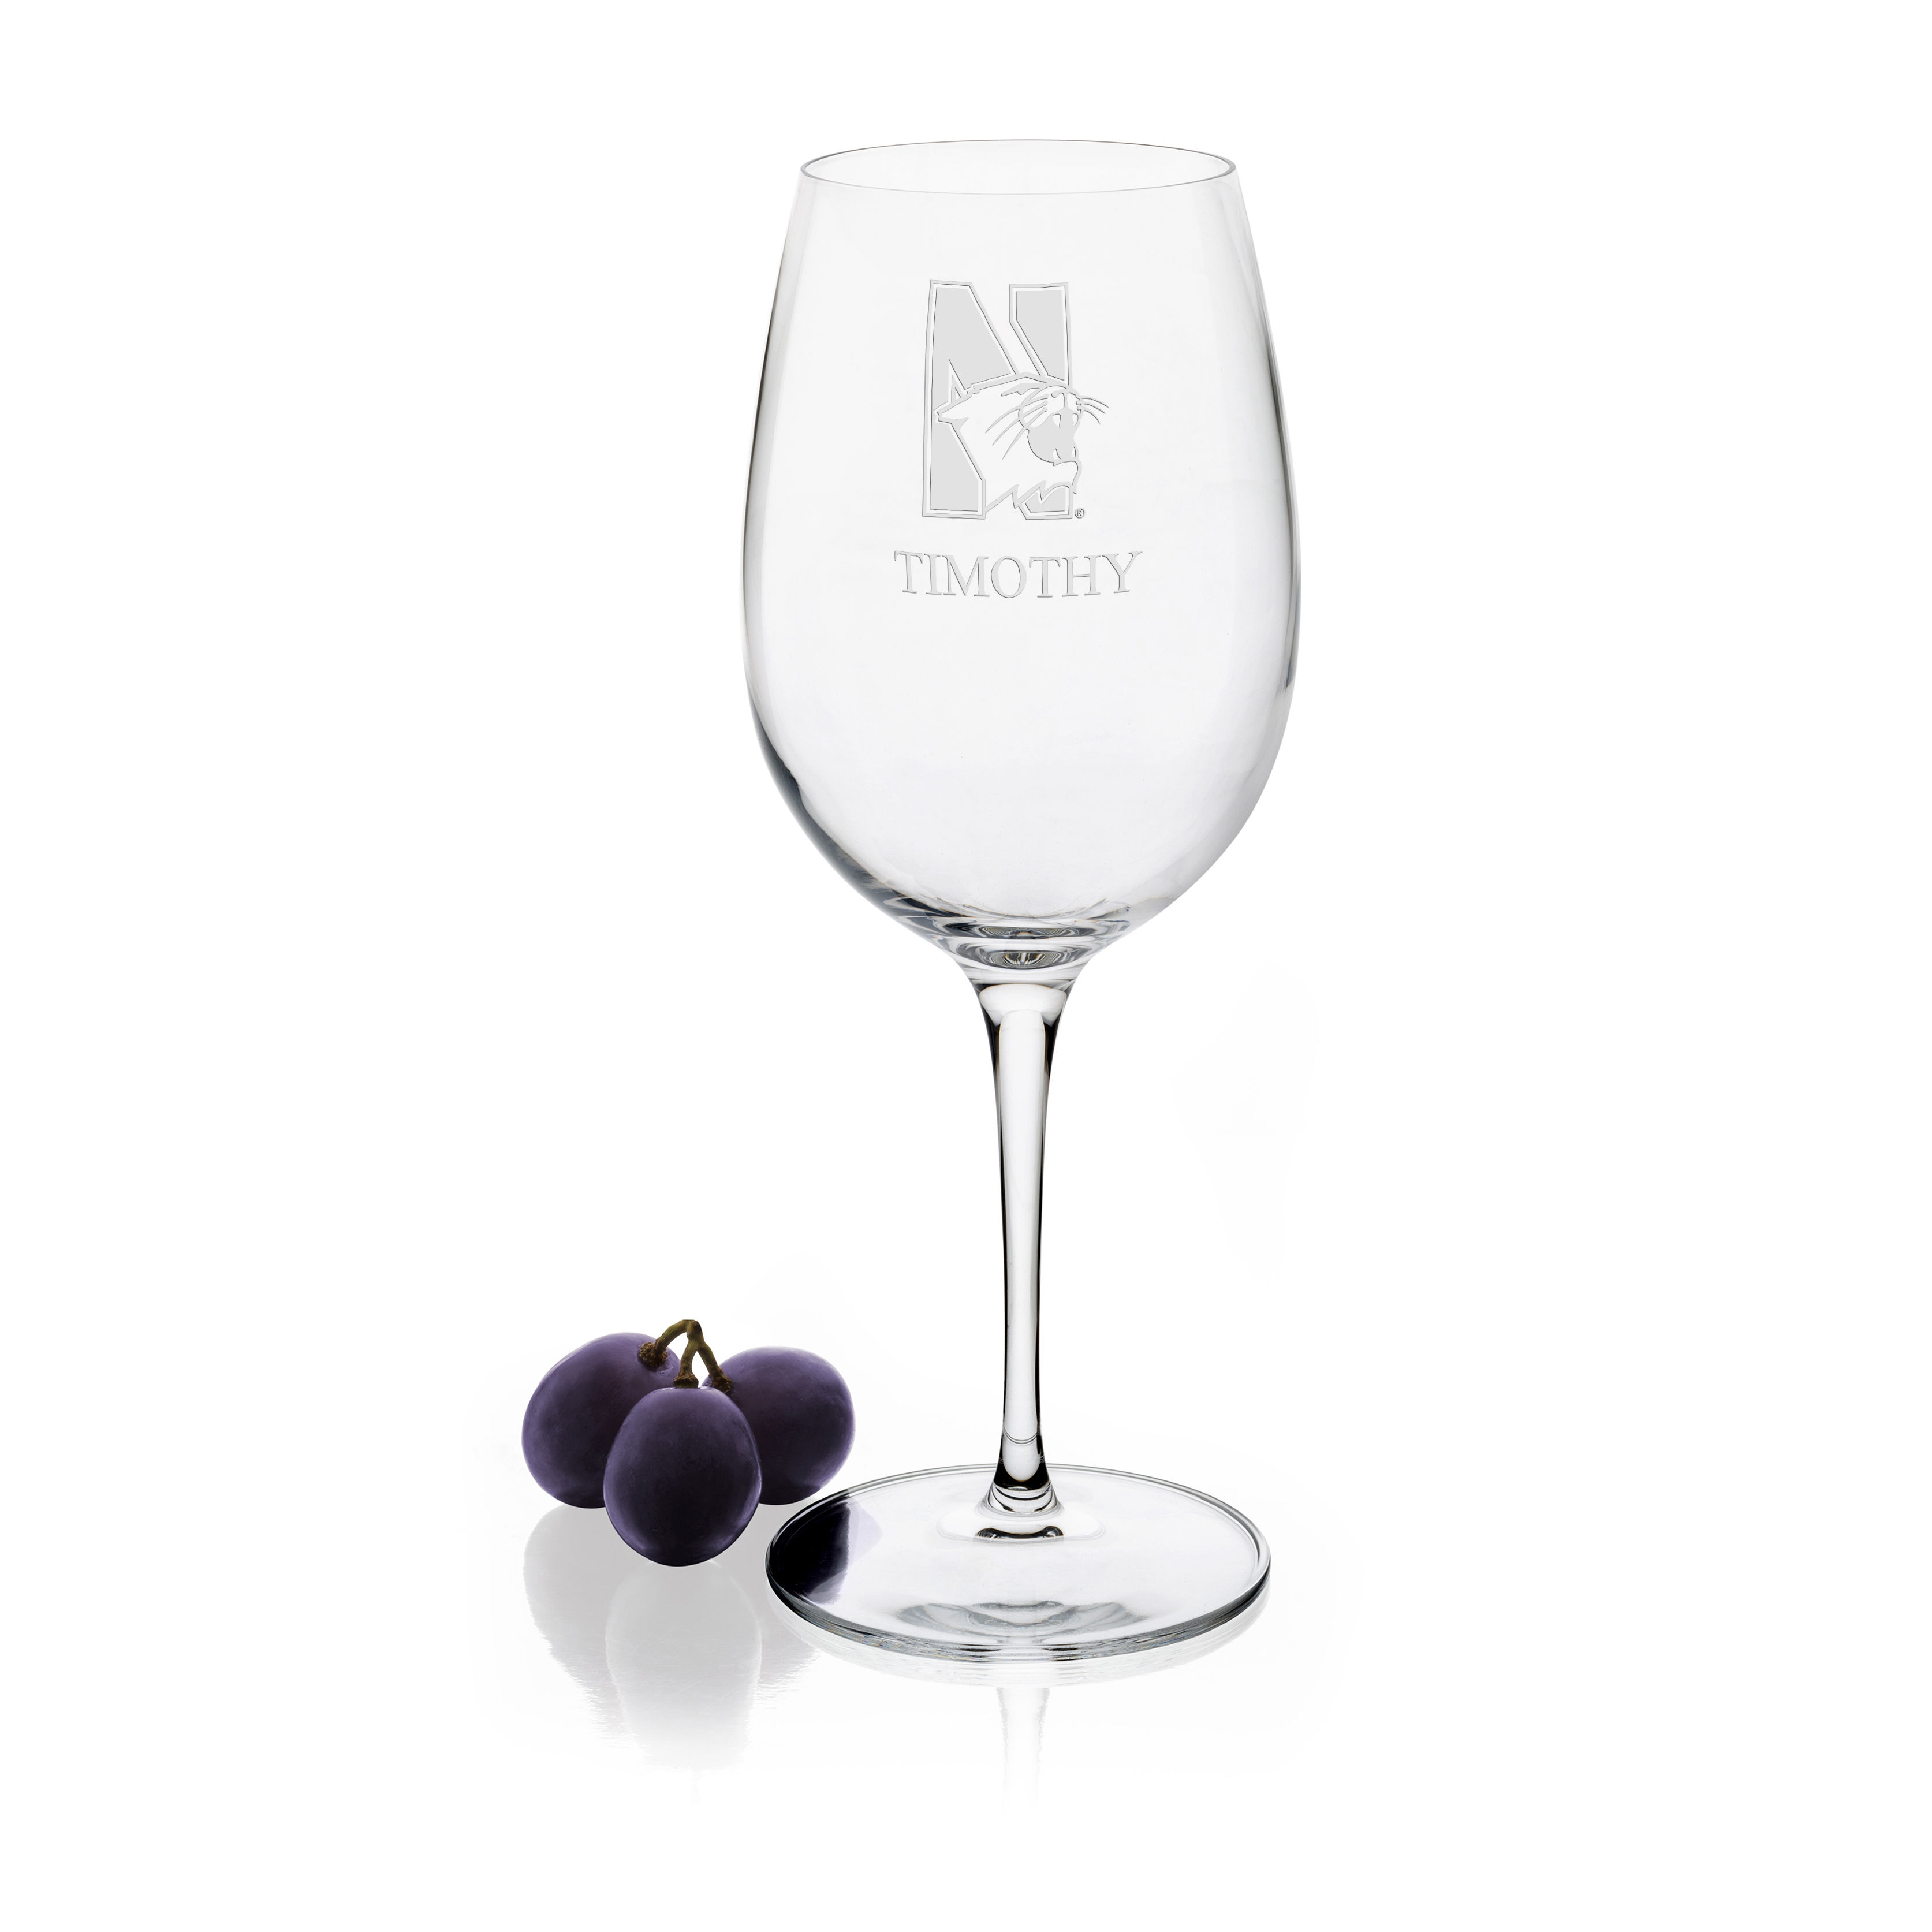 Northwestern University Red Wine Glasses - Set of 4